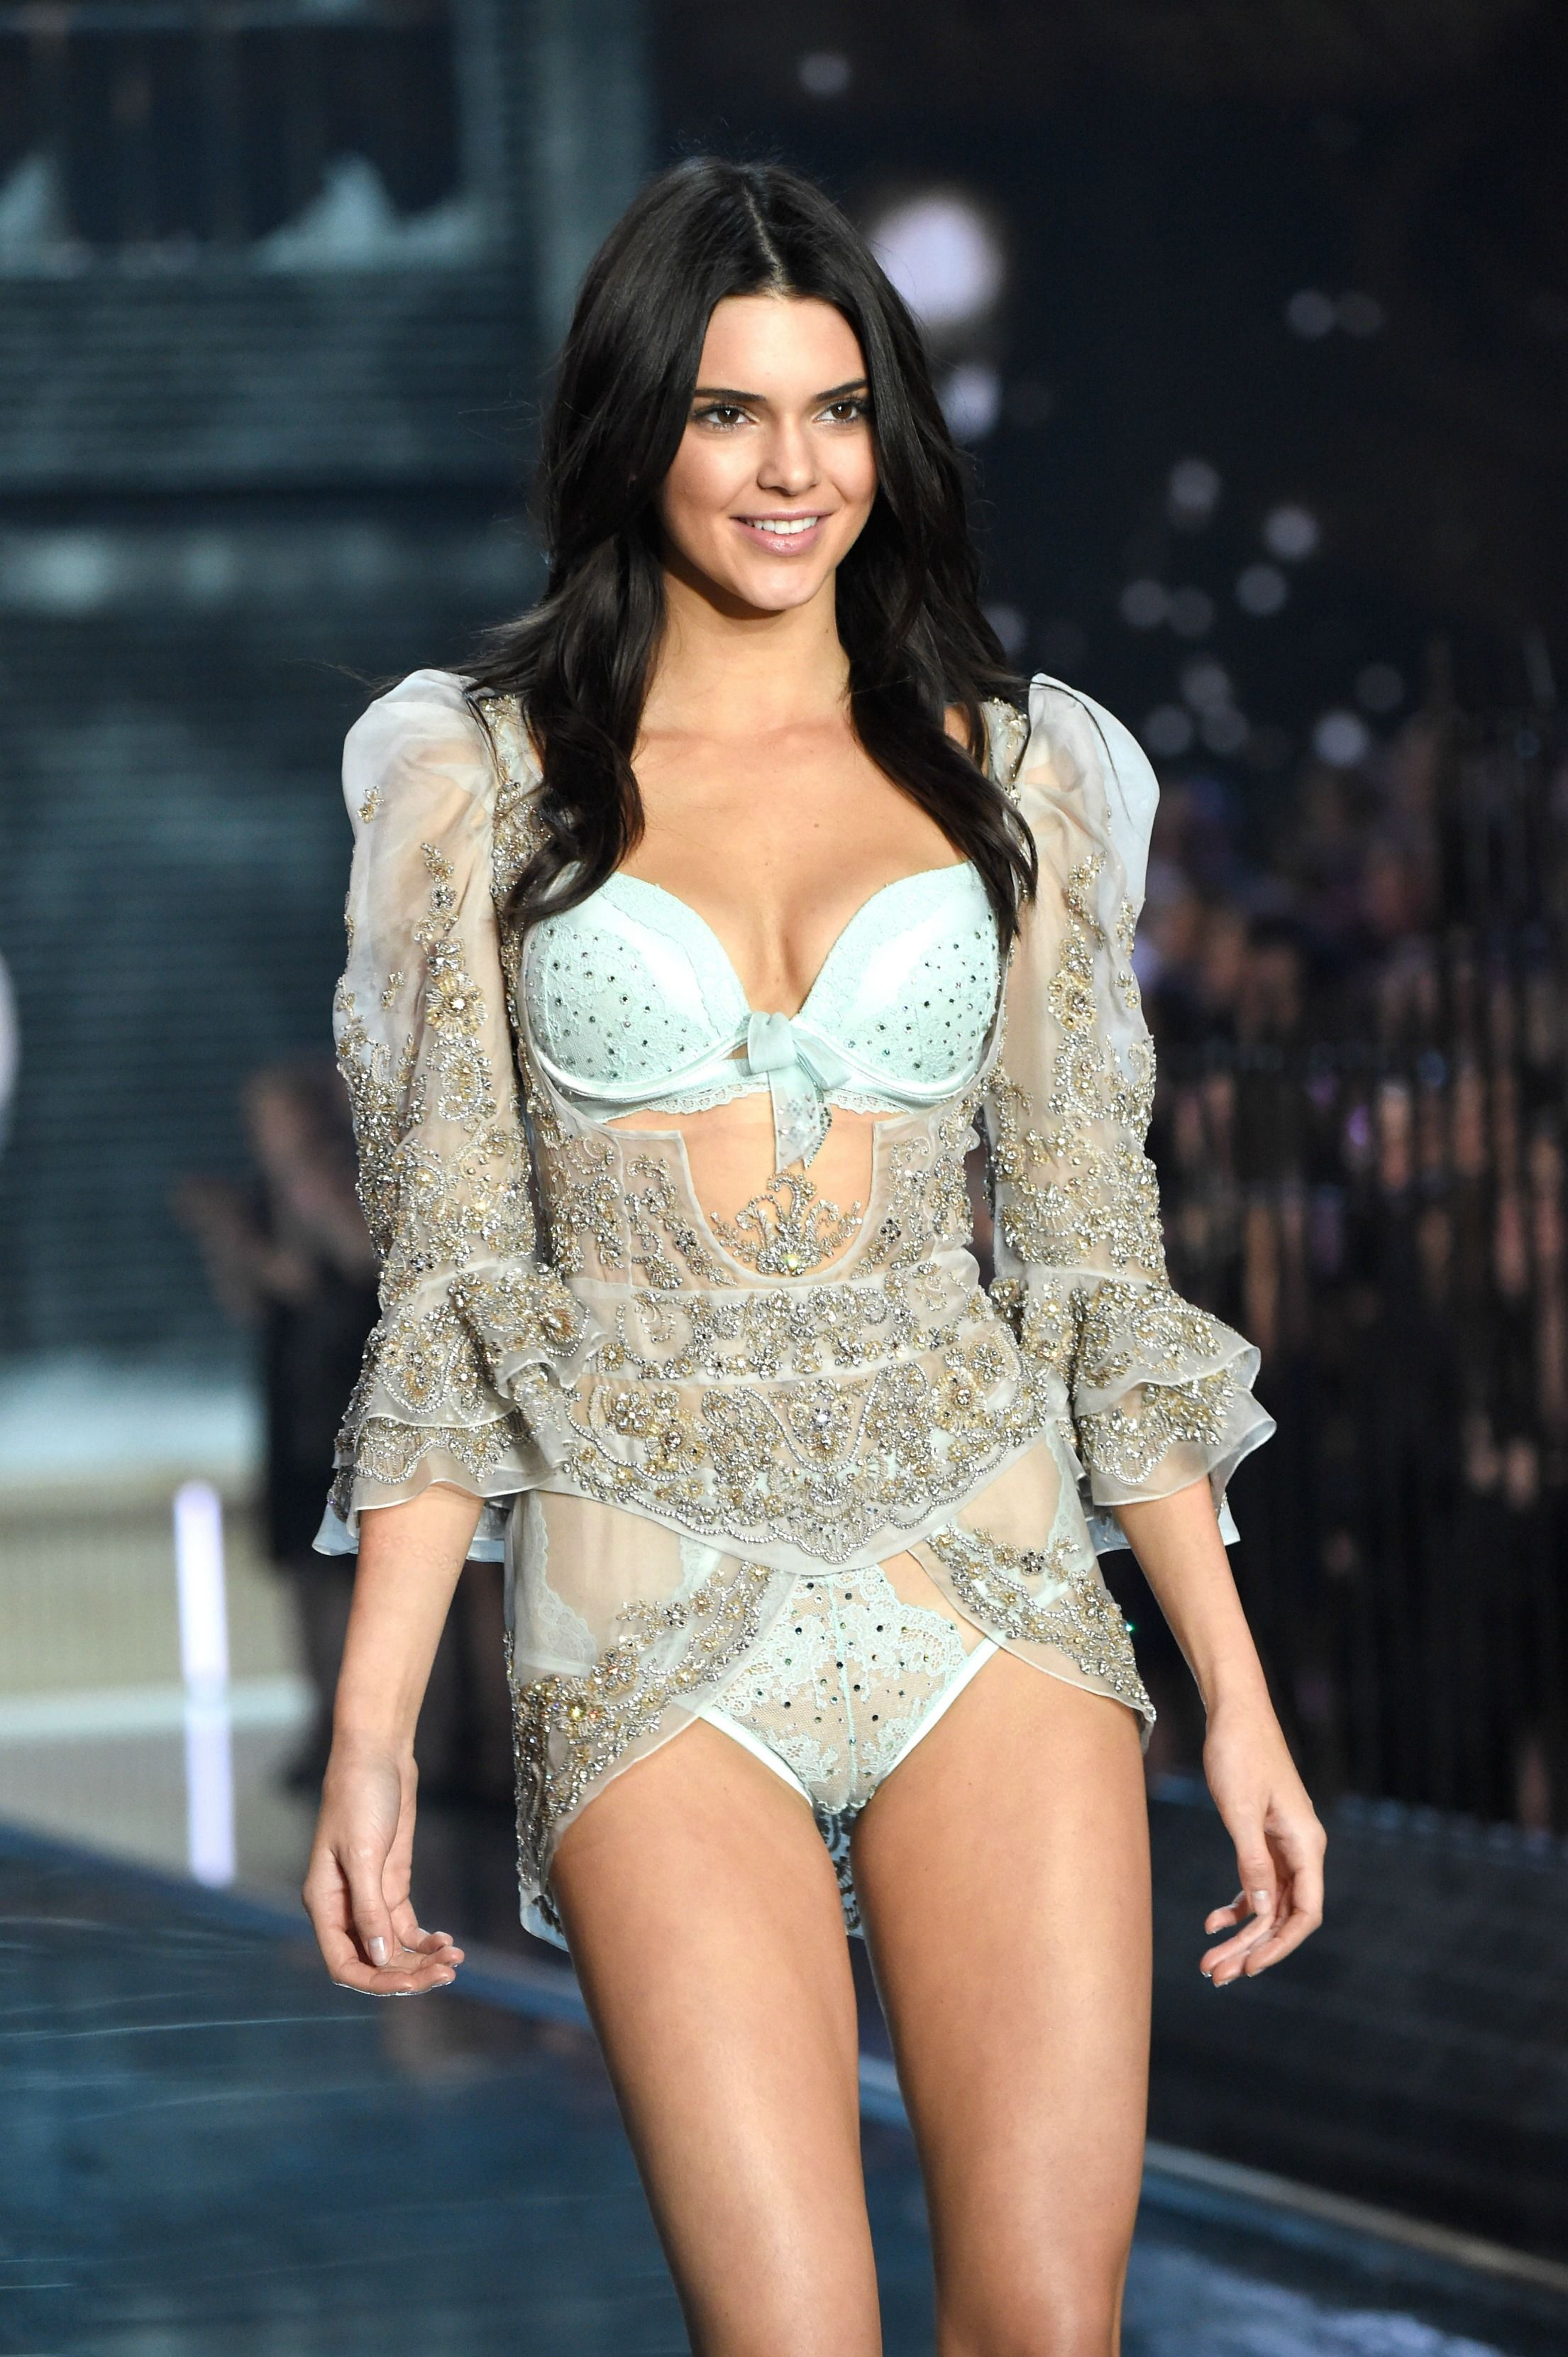 Victoria\u0027s Secret Fashion Show 2015 | Victoria secret, Vs angels ...